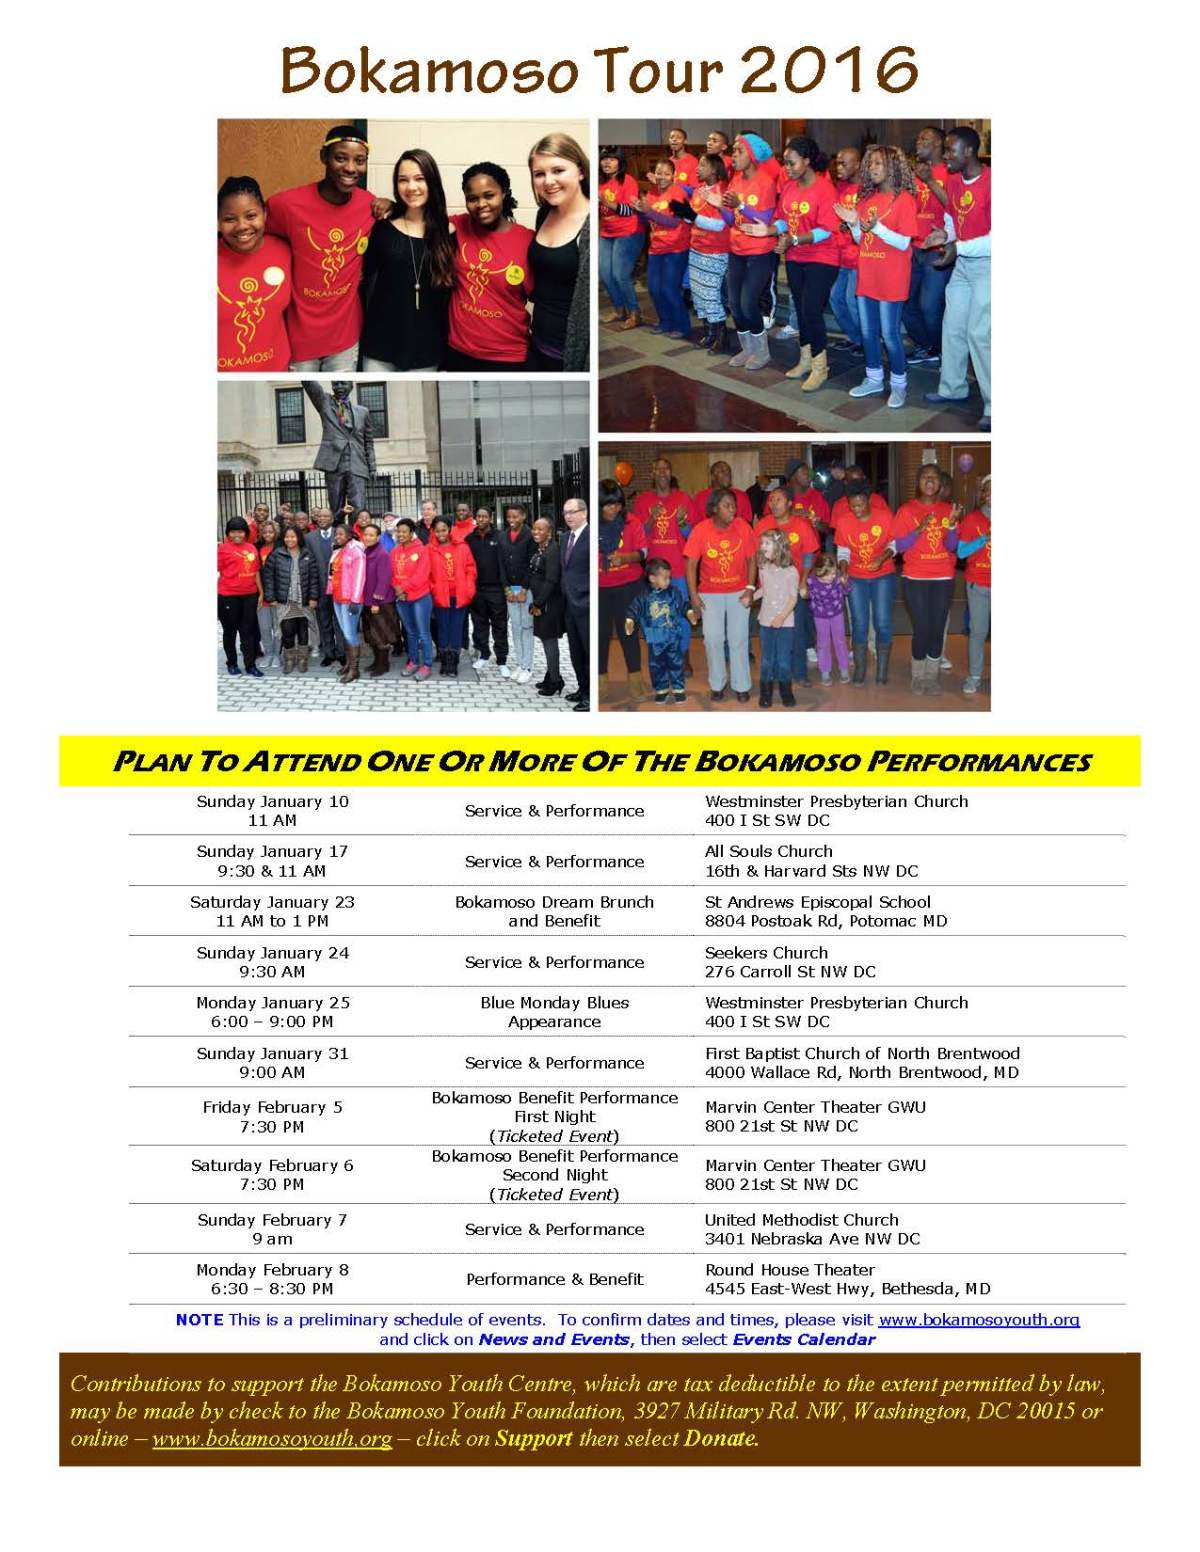 Bokamoso-2016-Tour-Schedule-Flyer